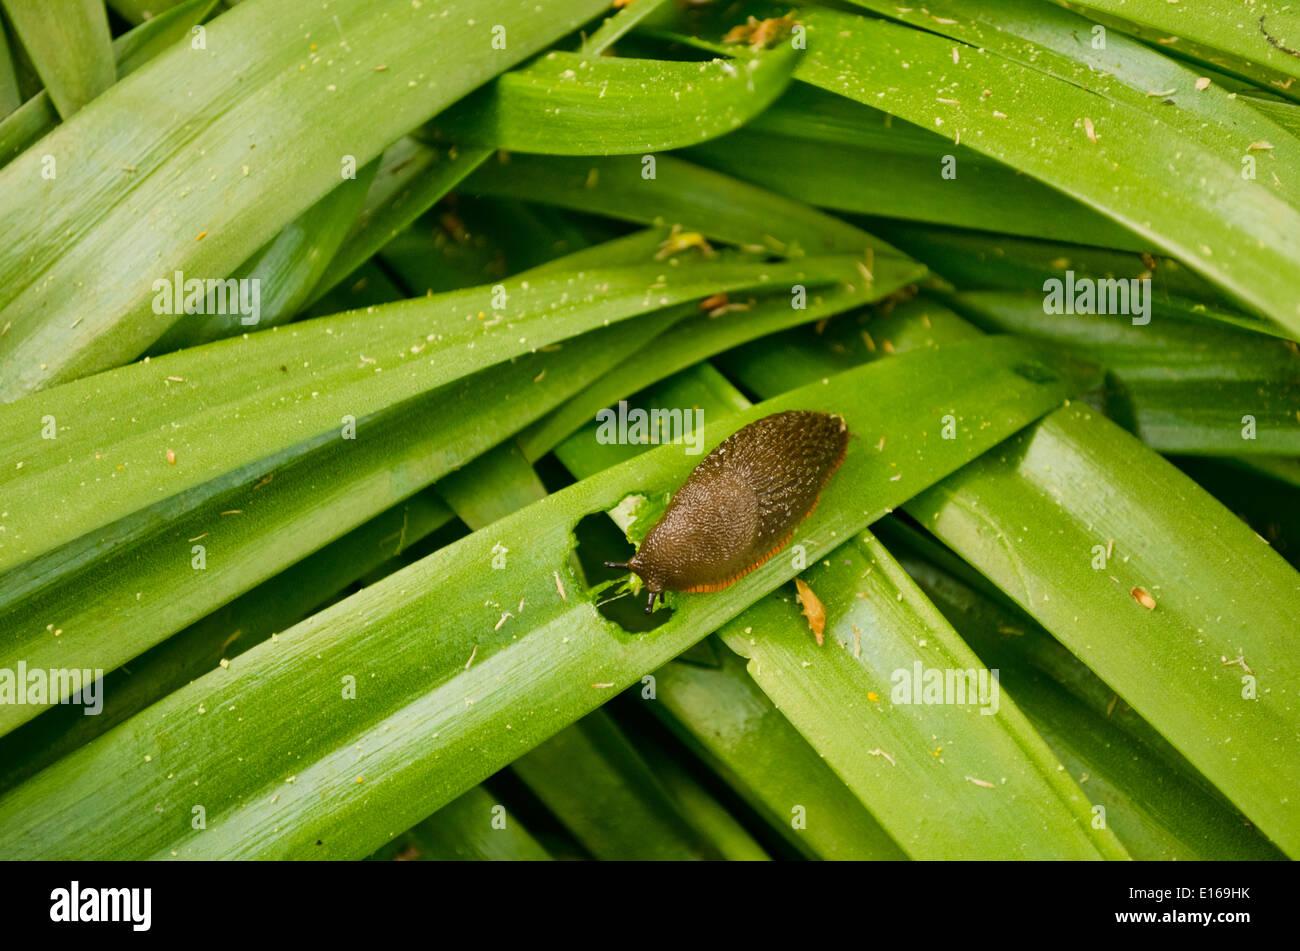 Chocolate slug, Arion rufus, aka Licorice slug or black slug eating green leaves in the garden.  Garden pest that damages foliage. - Stock Image